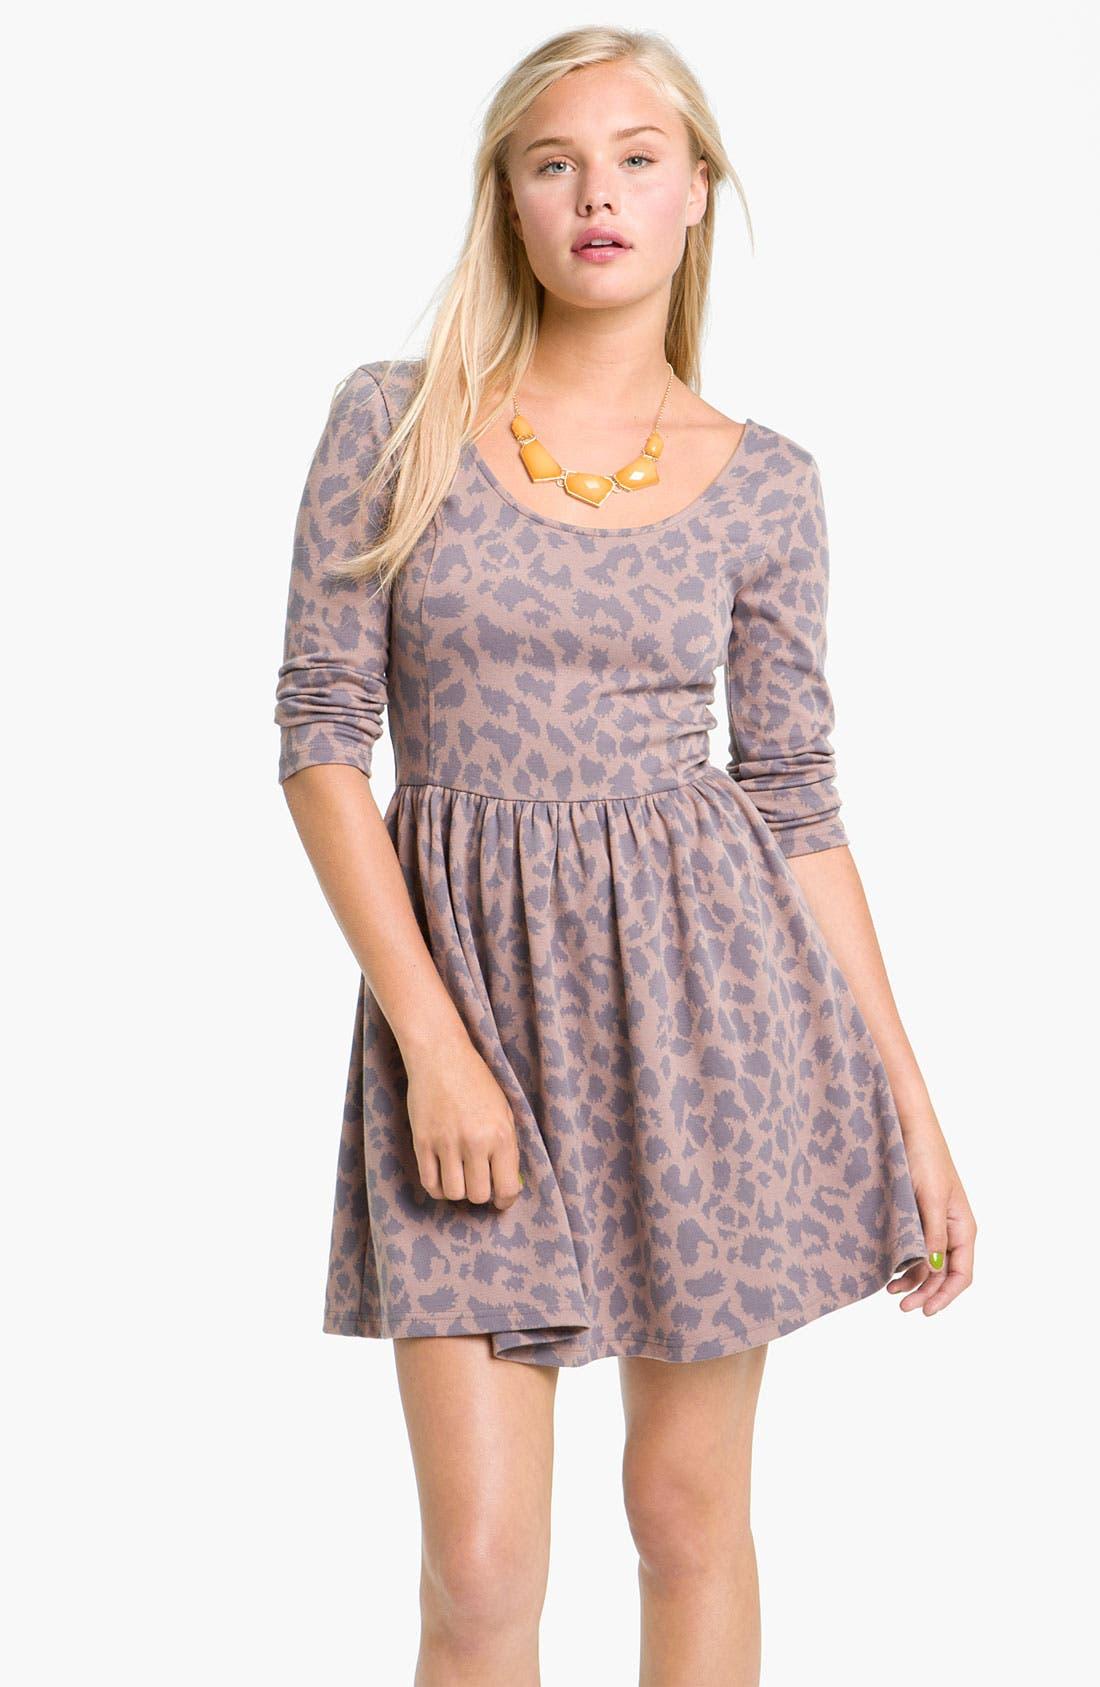 Alternate Image 1 Selected - Frenchi® Leopard Print Knit Dress